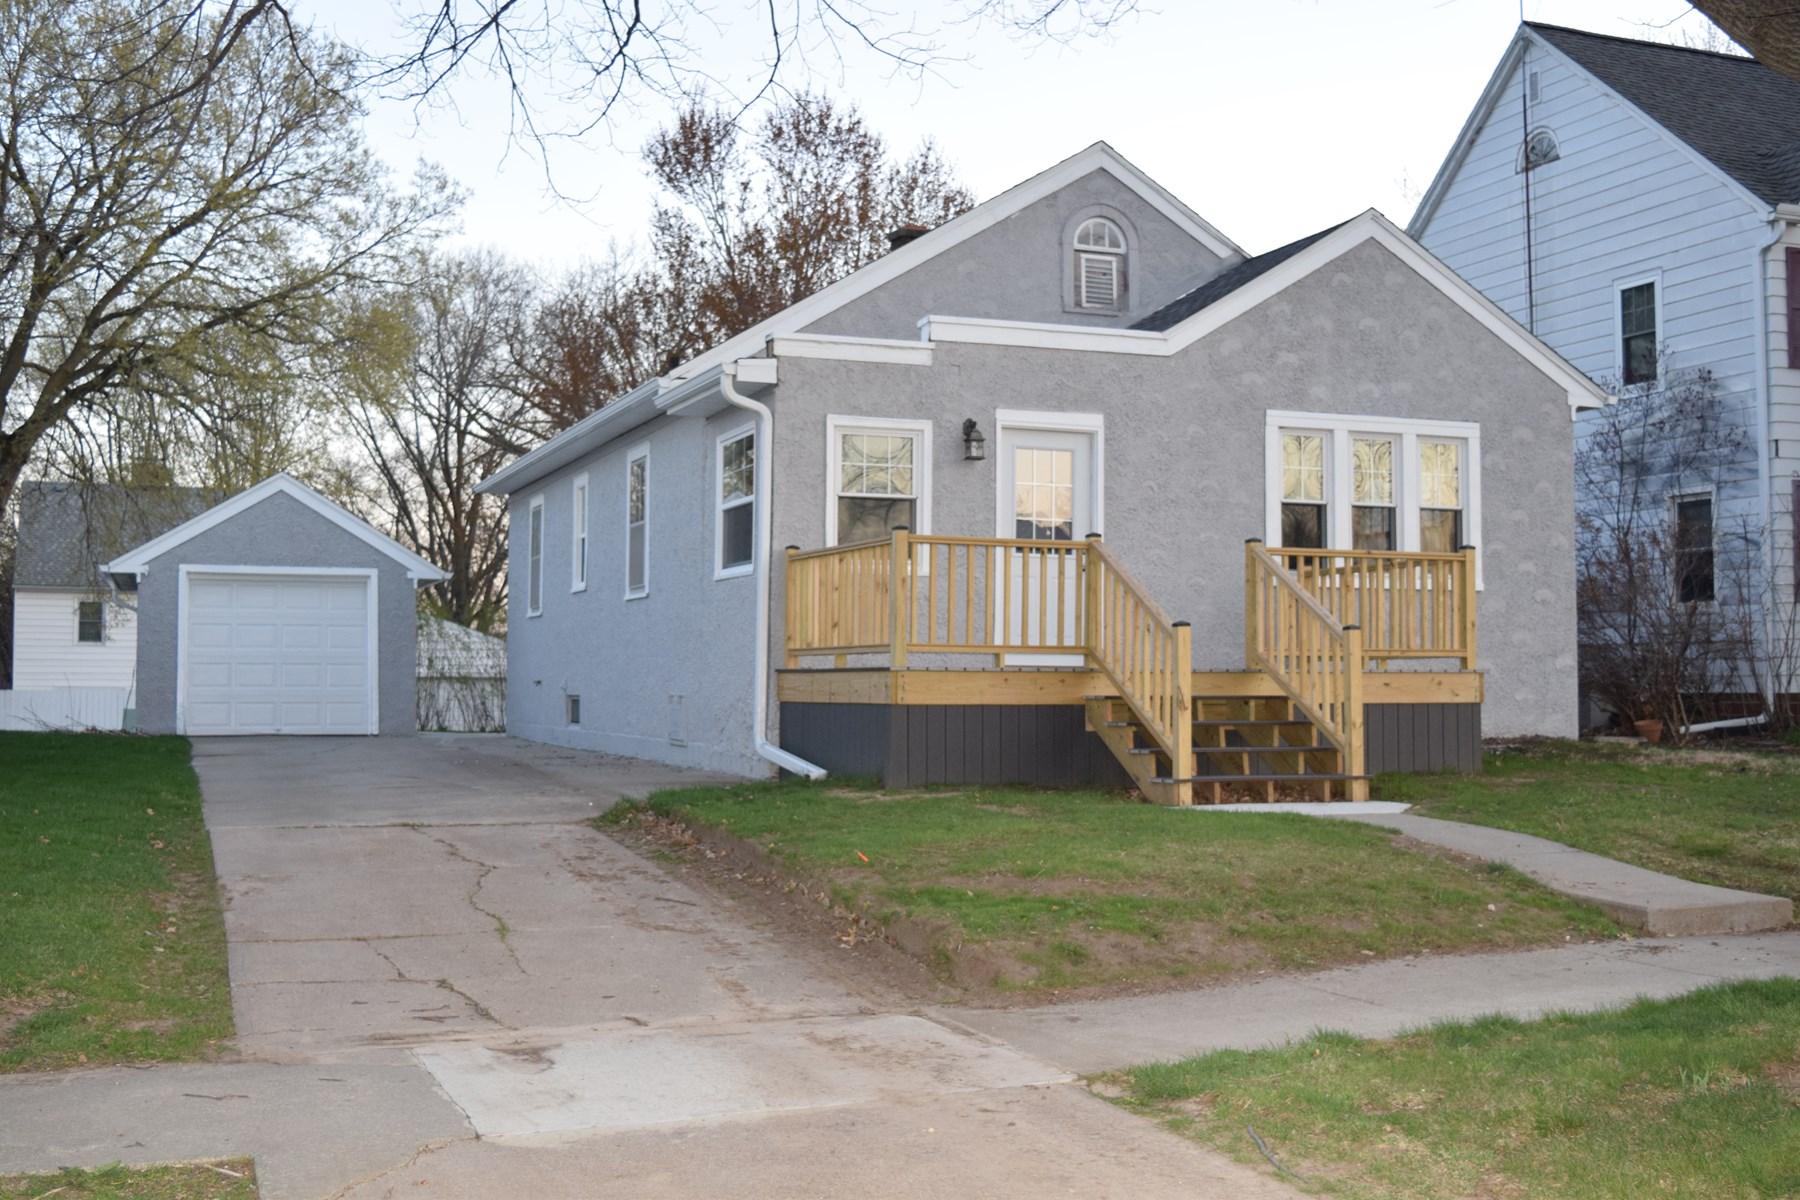 1-story home, Family room, Fireplace, Harlan, IA, Shelby Co.